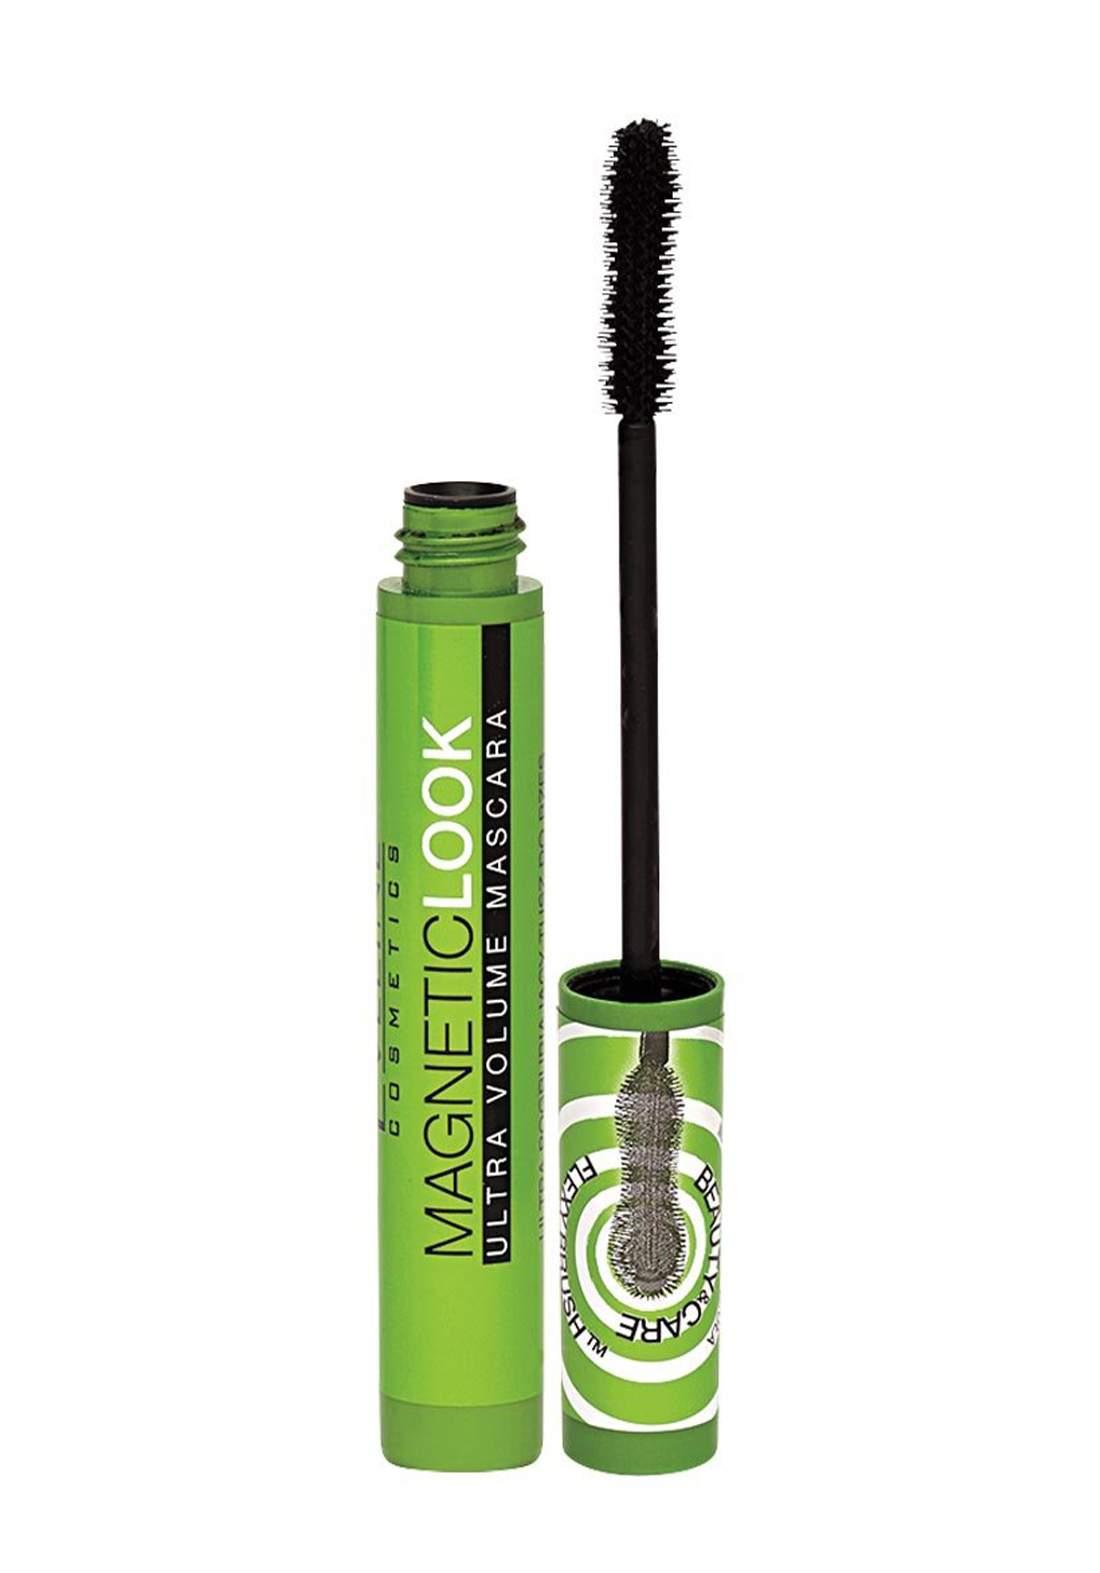 (095-0085)Eveline Cosmetics Magnetic Look Ultra Volume Mascara ماسكارا